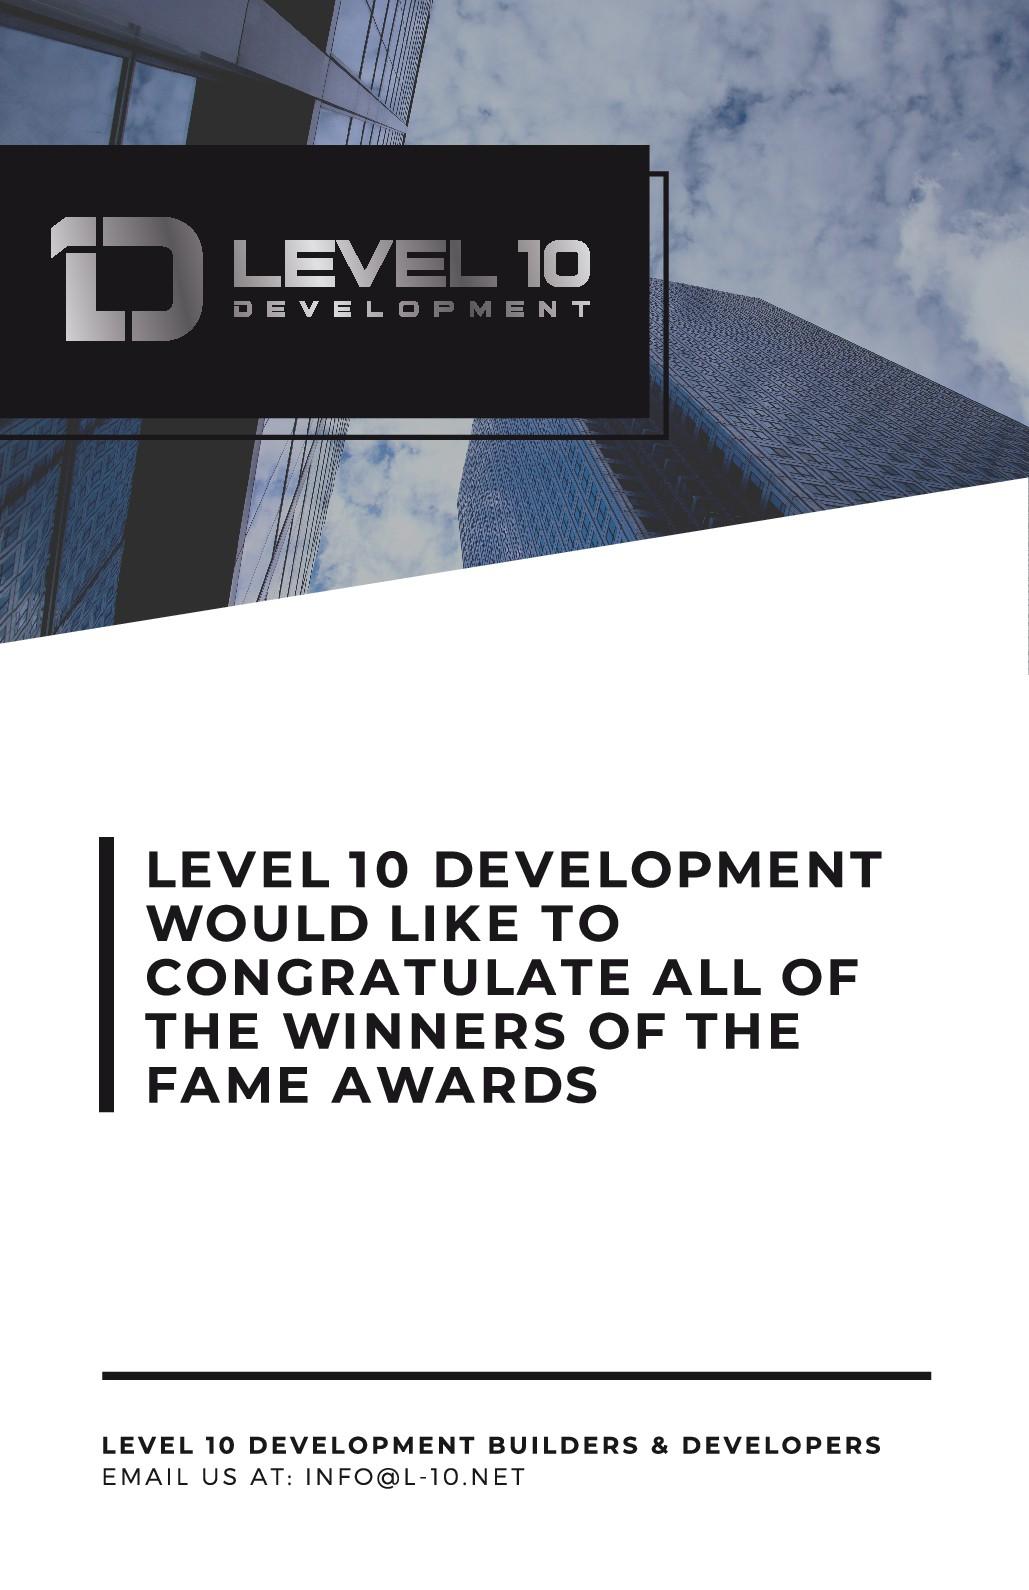 Event ad for real estate development company